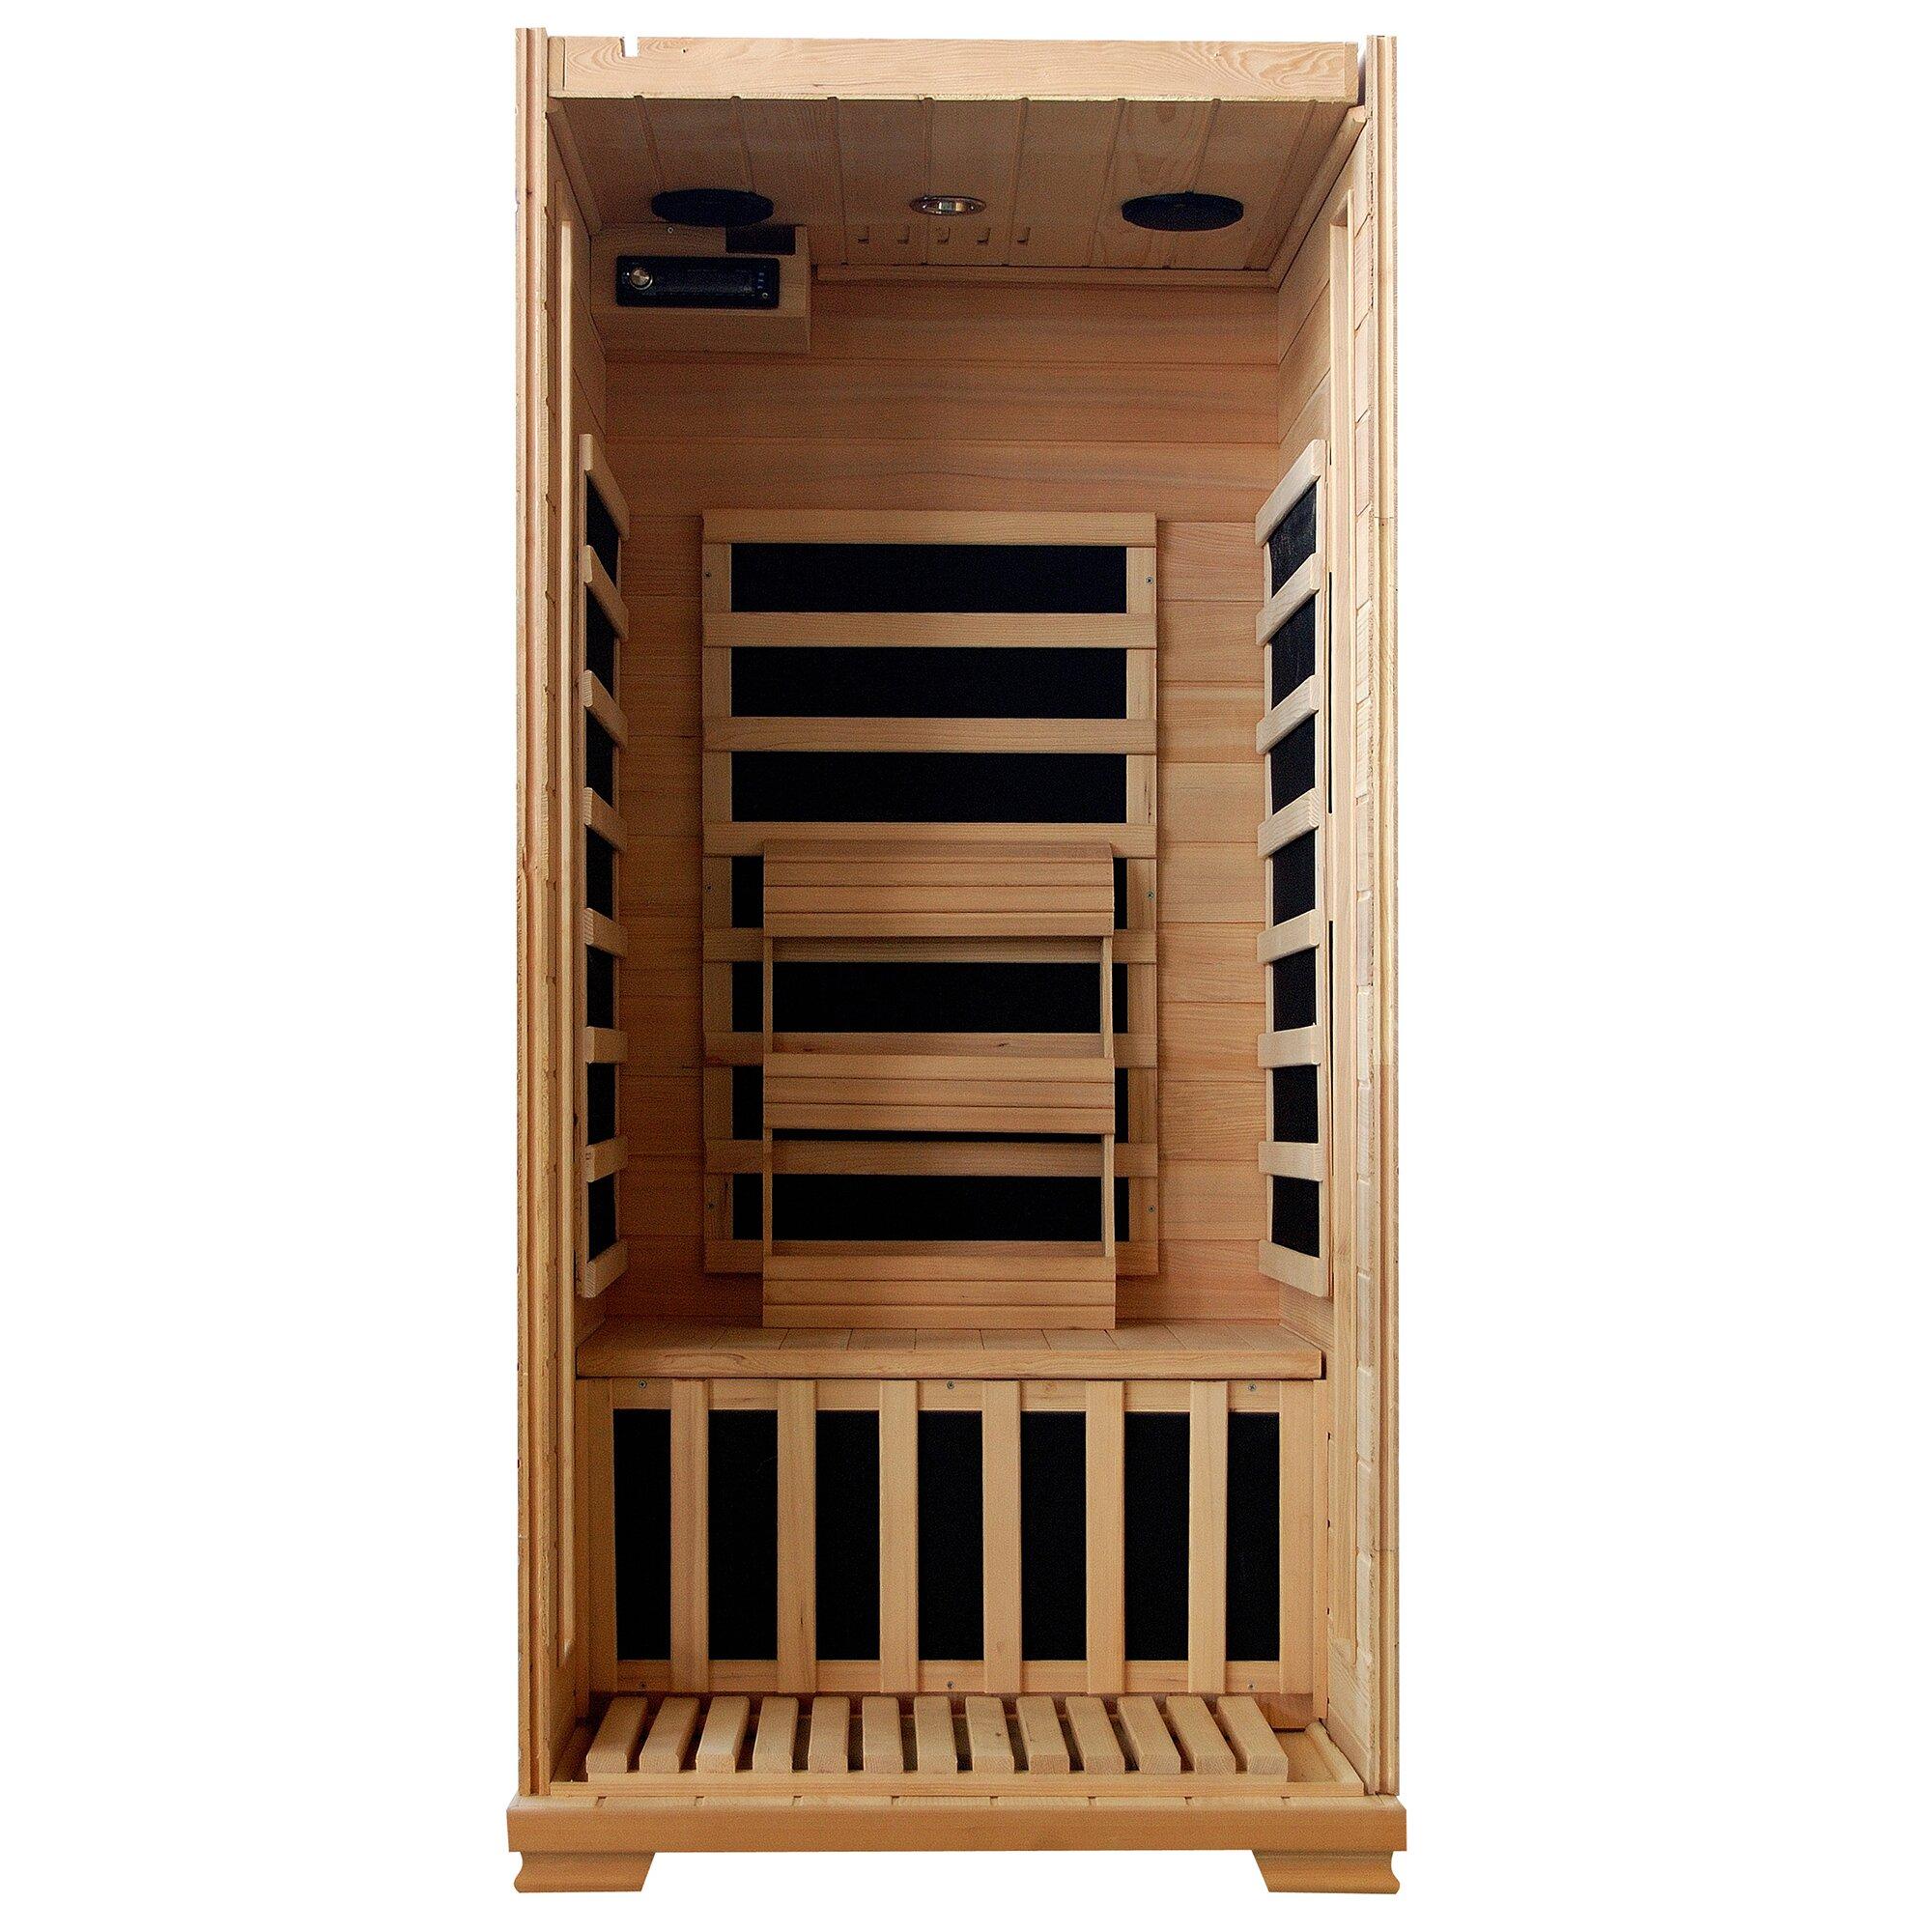 radiant saunas 1 2 person hemlock infrared sauna with 4 carbon heaters reviews wayfair. Black Bedroom Furniture Sets. Home Design Ideas